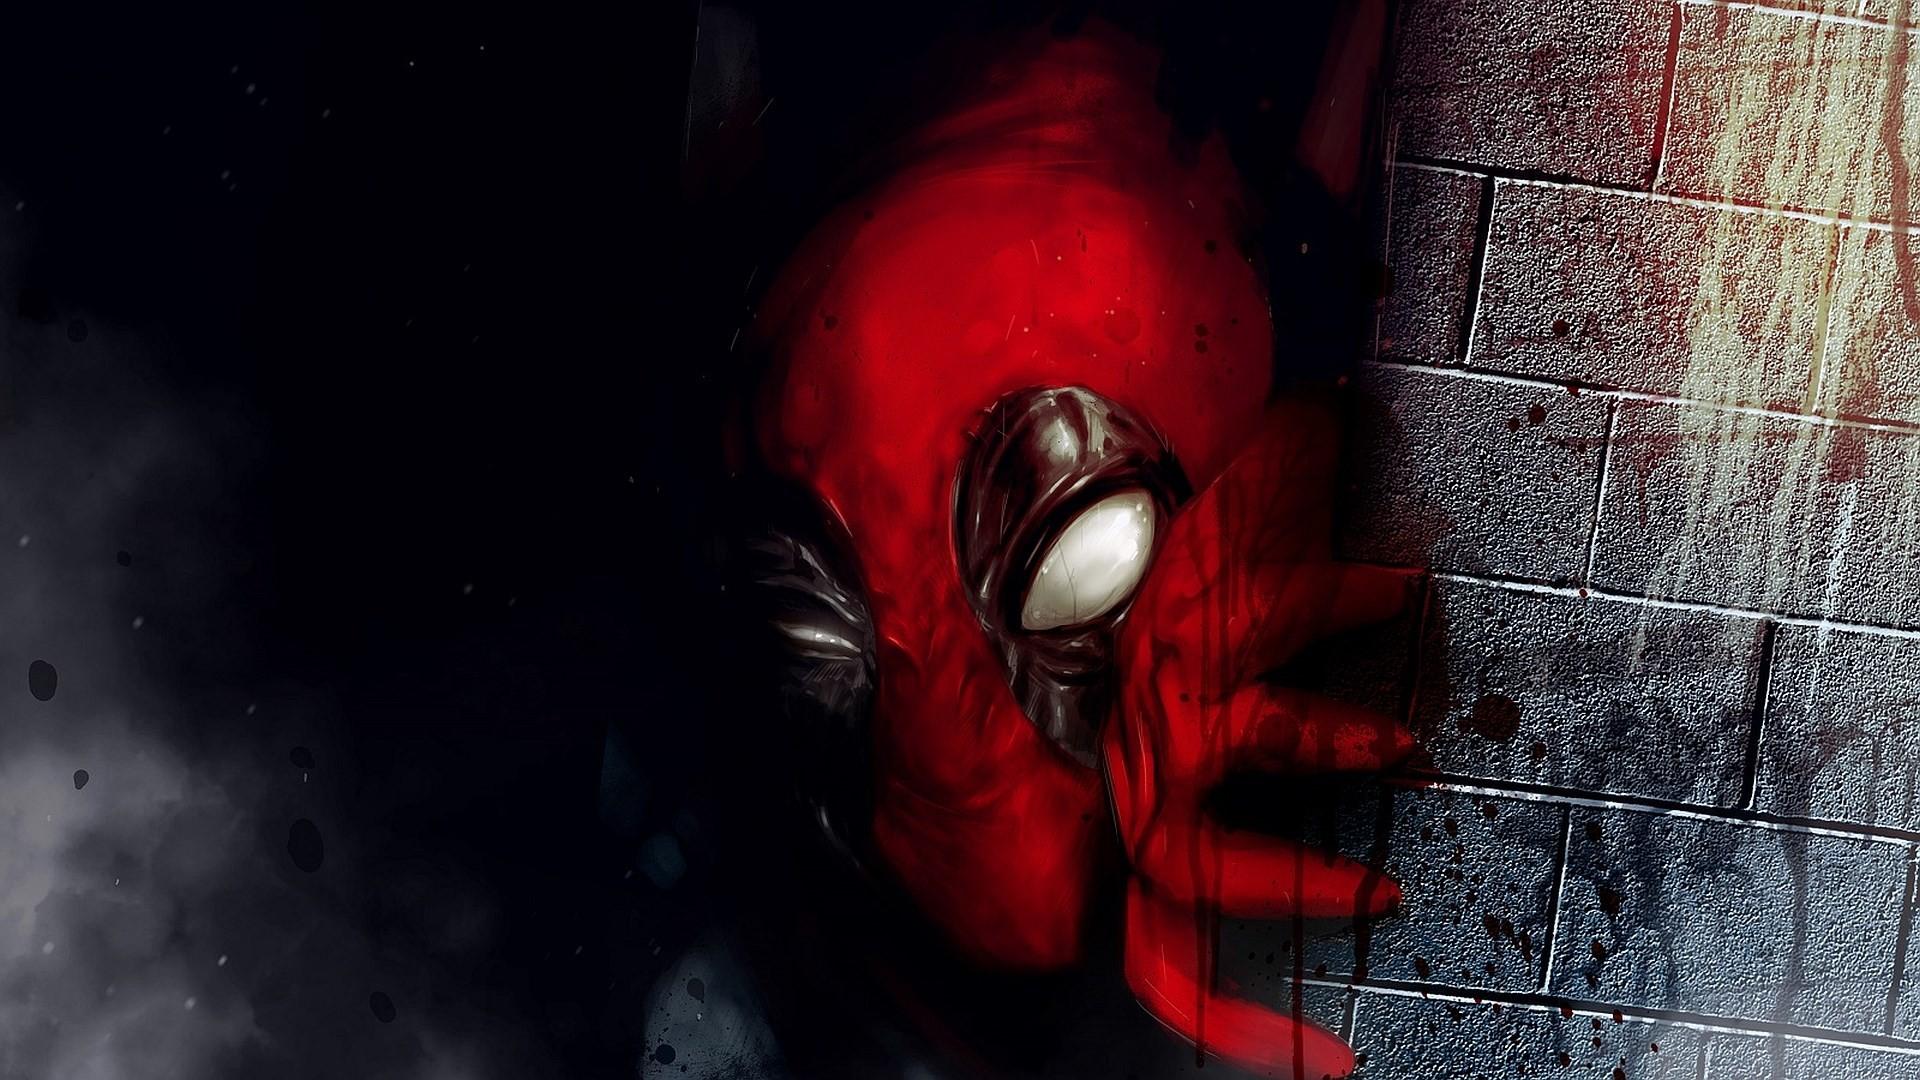 1000 Ideas About Deadpool Hd Wallpaper On Pinterest: Deadpool 1080p Wallpaper (79+ Images